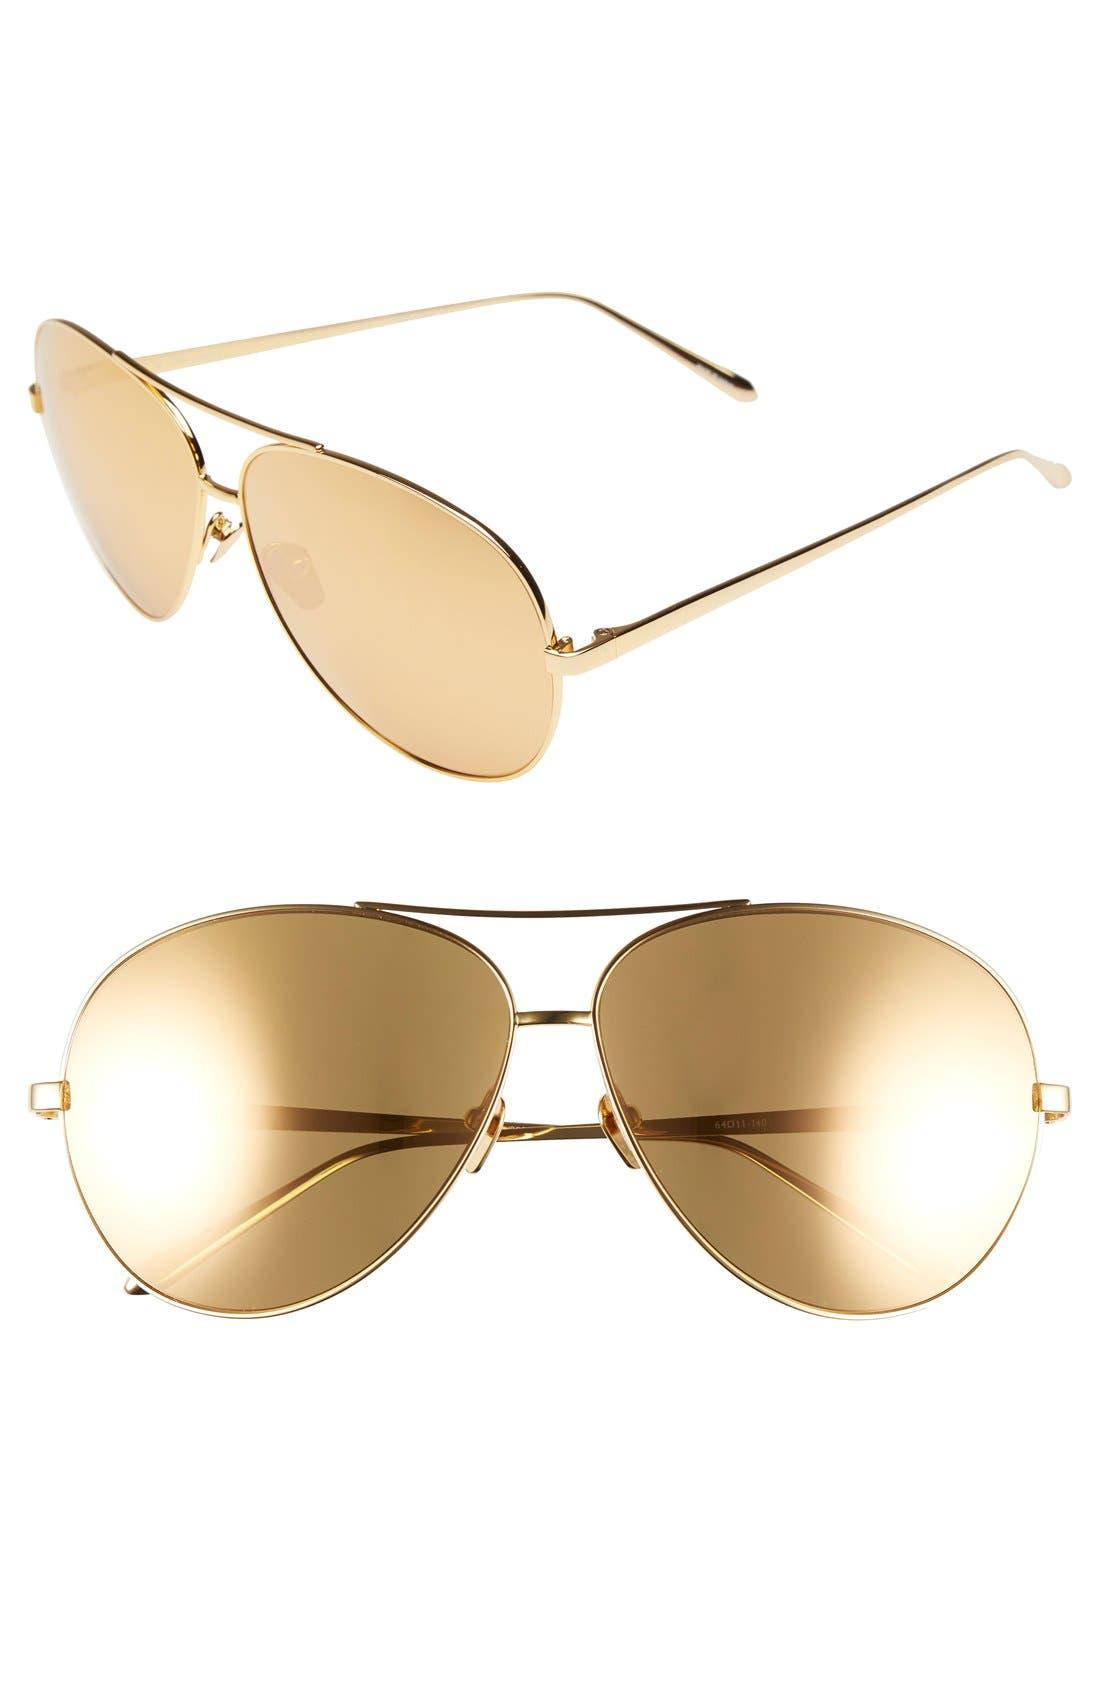 Alternate Image 1 Selected - Linda Farrow 64mm 22 Karat Gold Plated Aviator Sunglasses